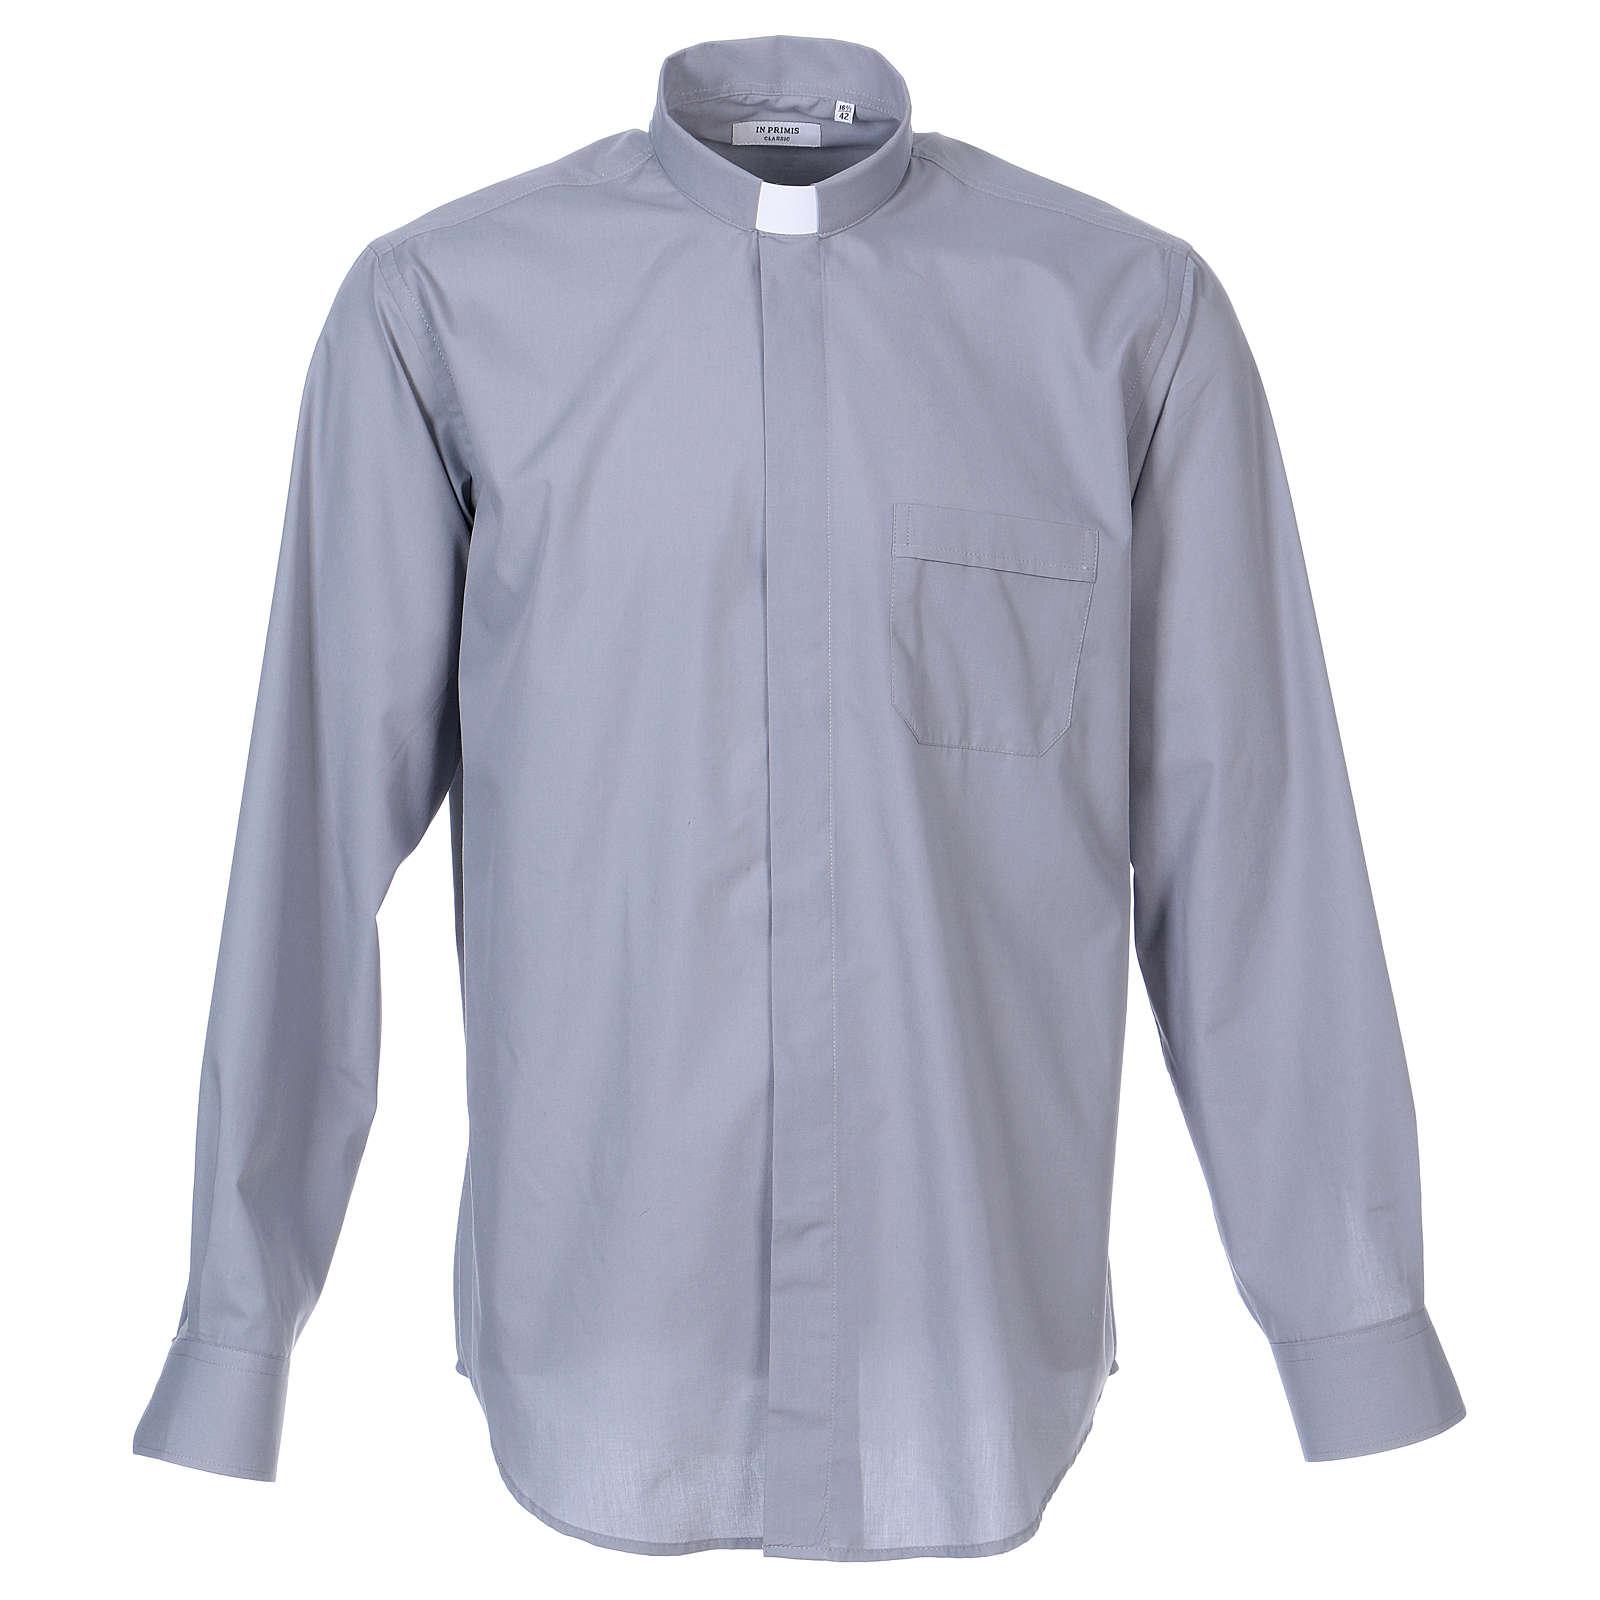 Camisa de sacerdote manga longa misto algodão cinzento claro In Primis 4